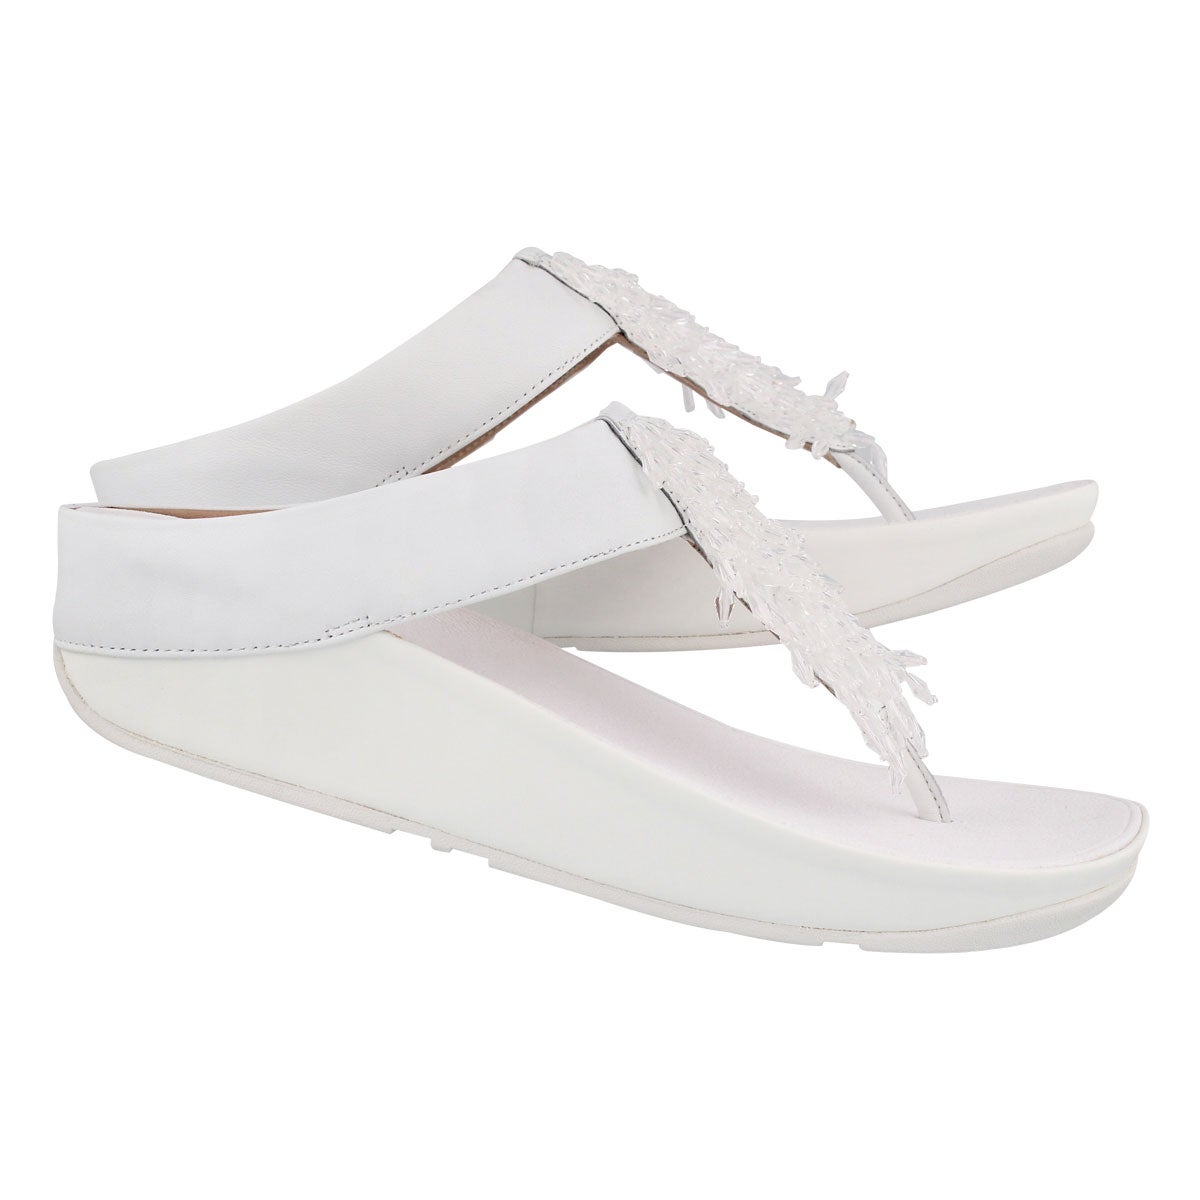 Lds Rumba urban wht fringe thong sandal